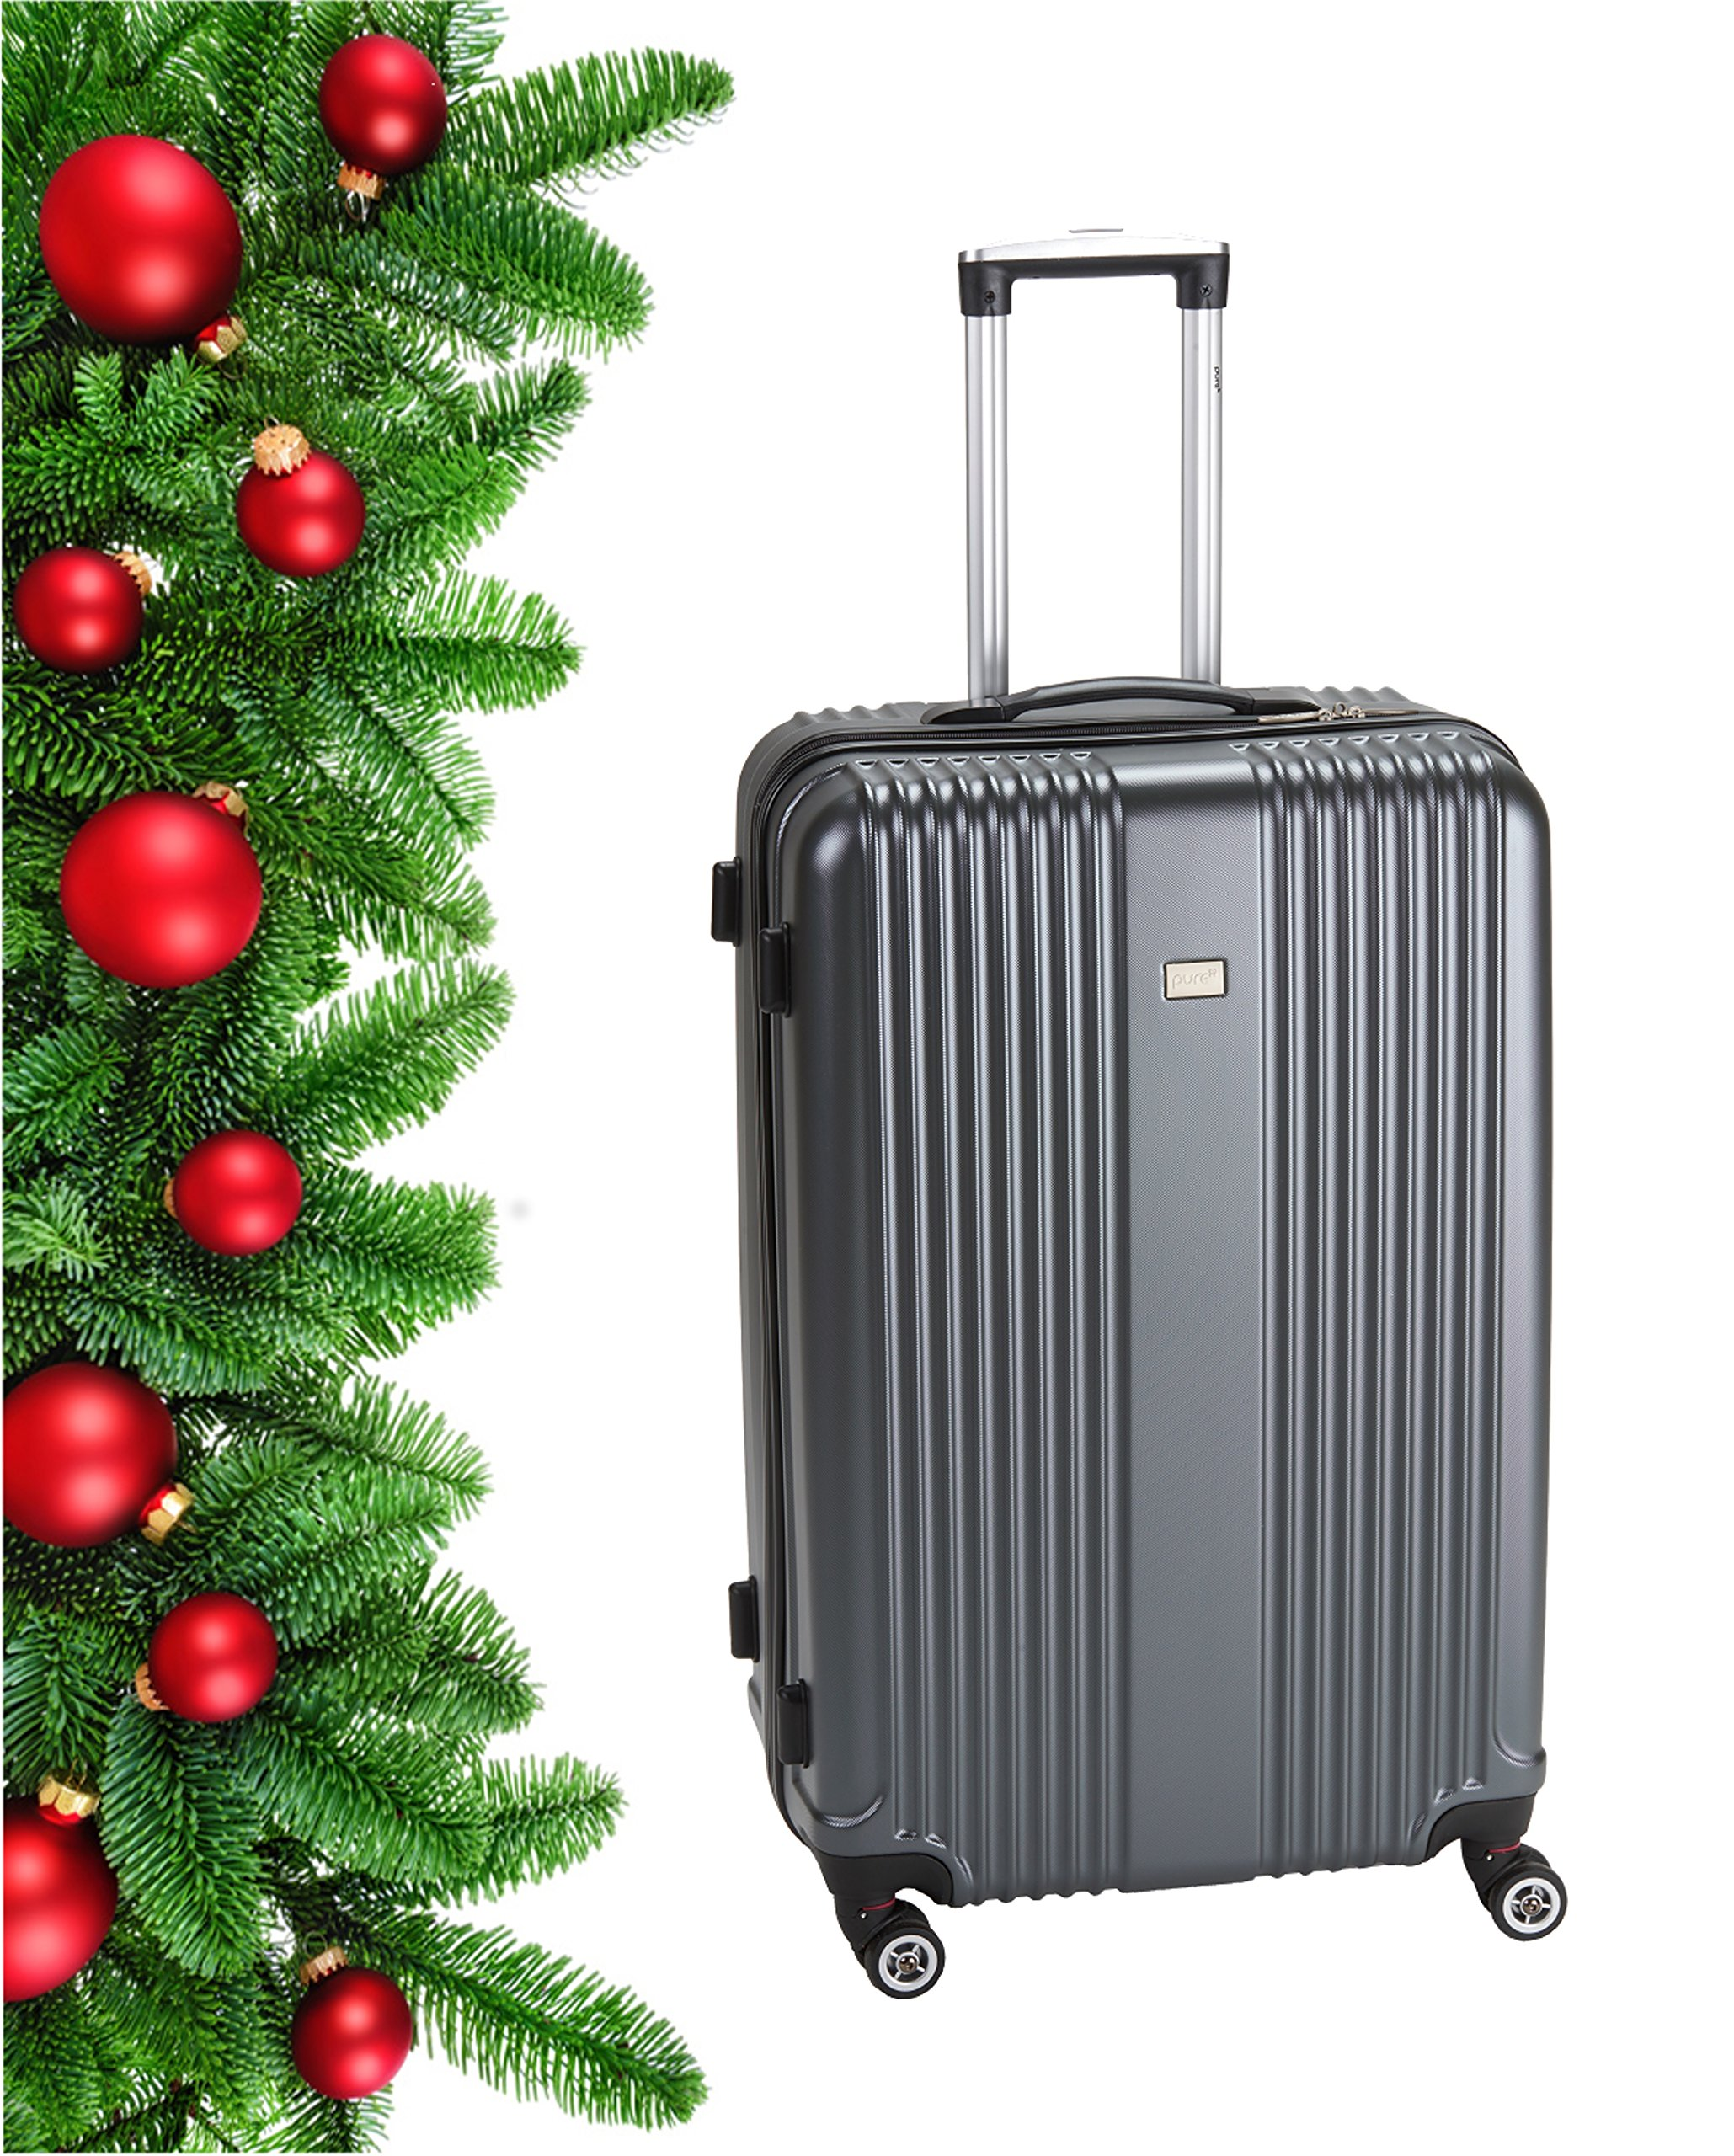 Pure-Koffer-SensationReisekoffer-HartschaleTrolley-Robustes-PET-4-RollenTSA-ZahlenschlossReisegepck